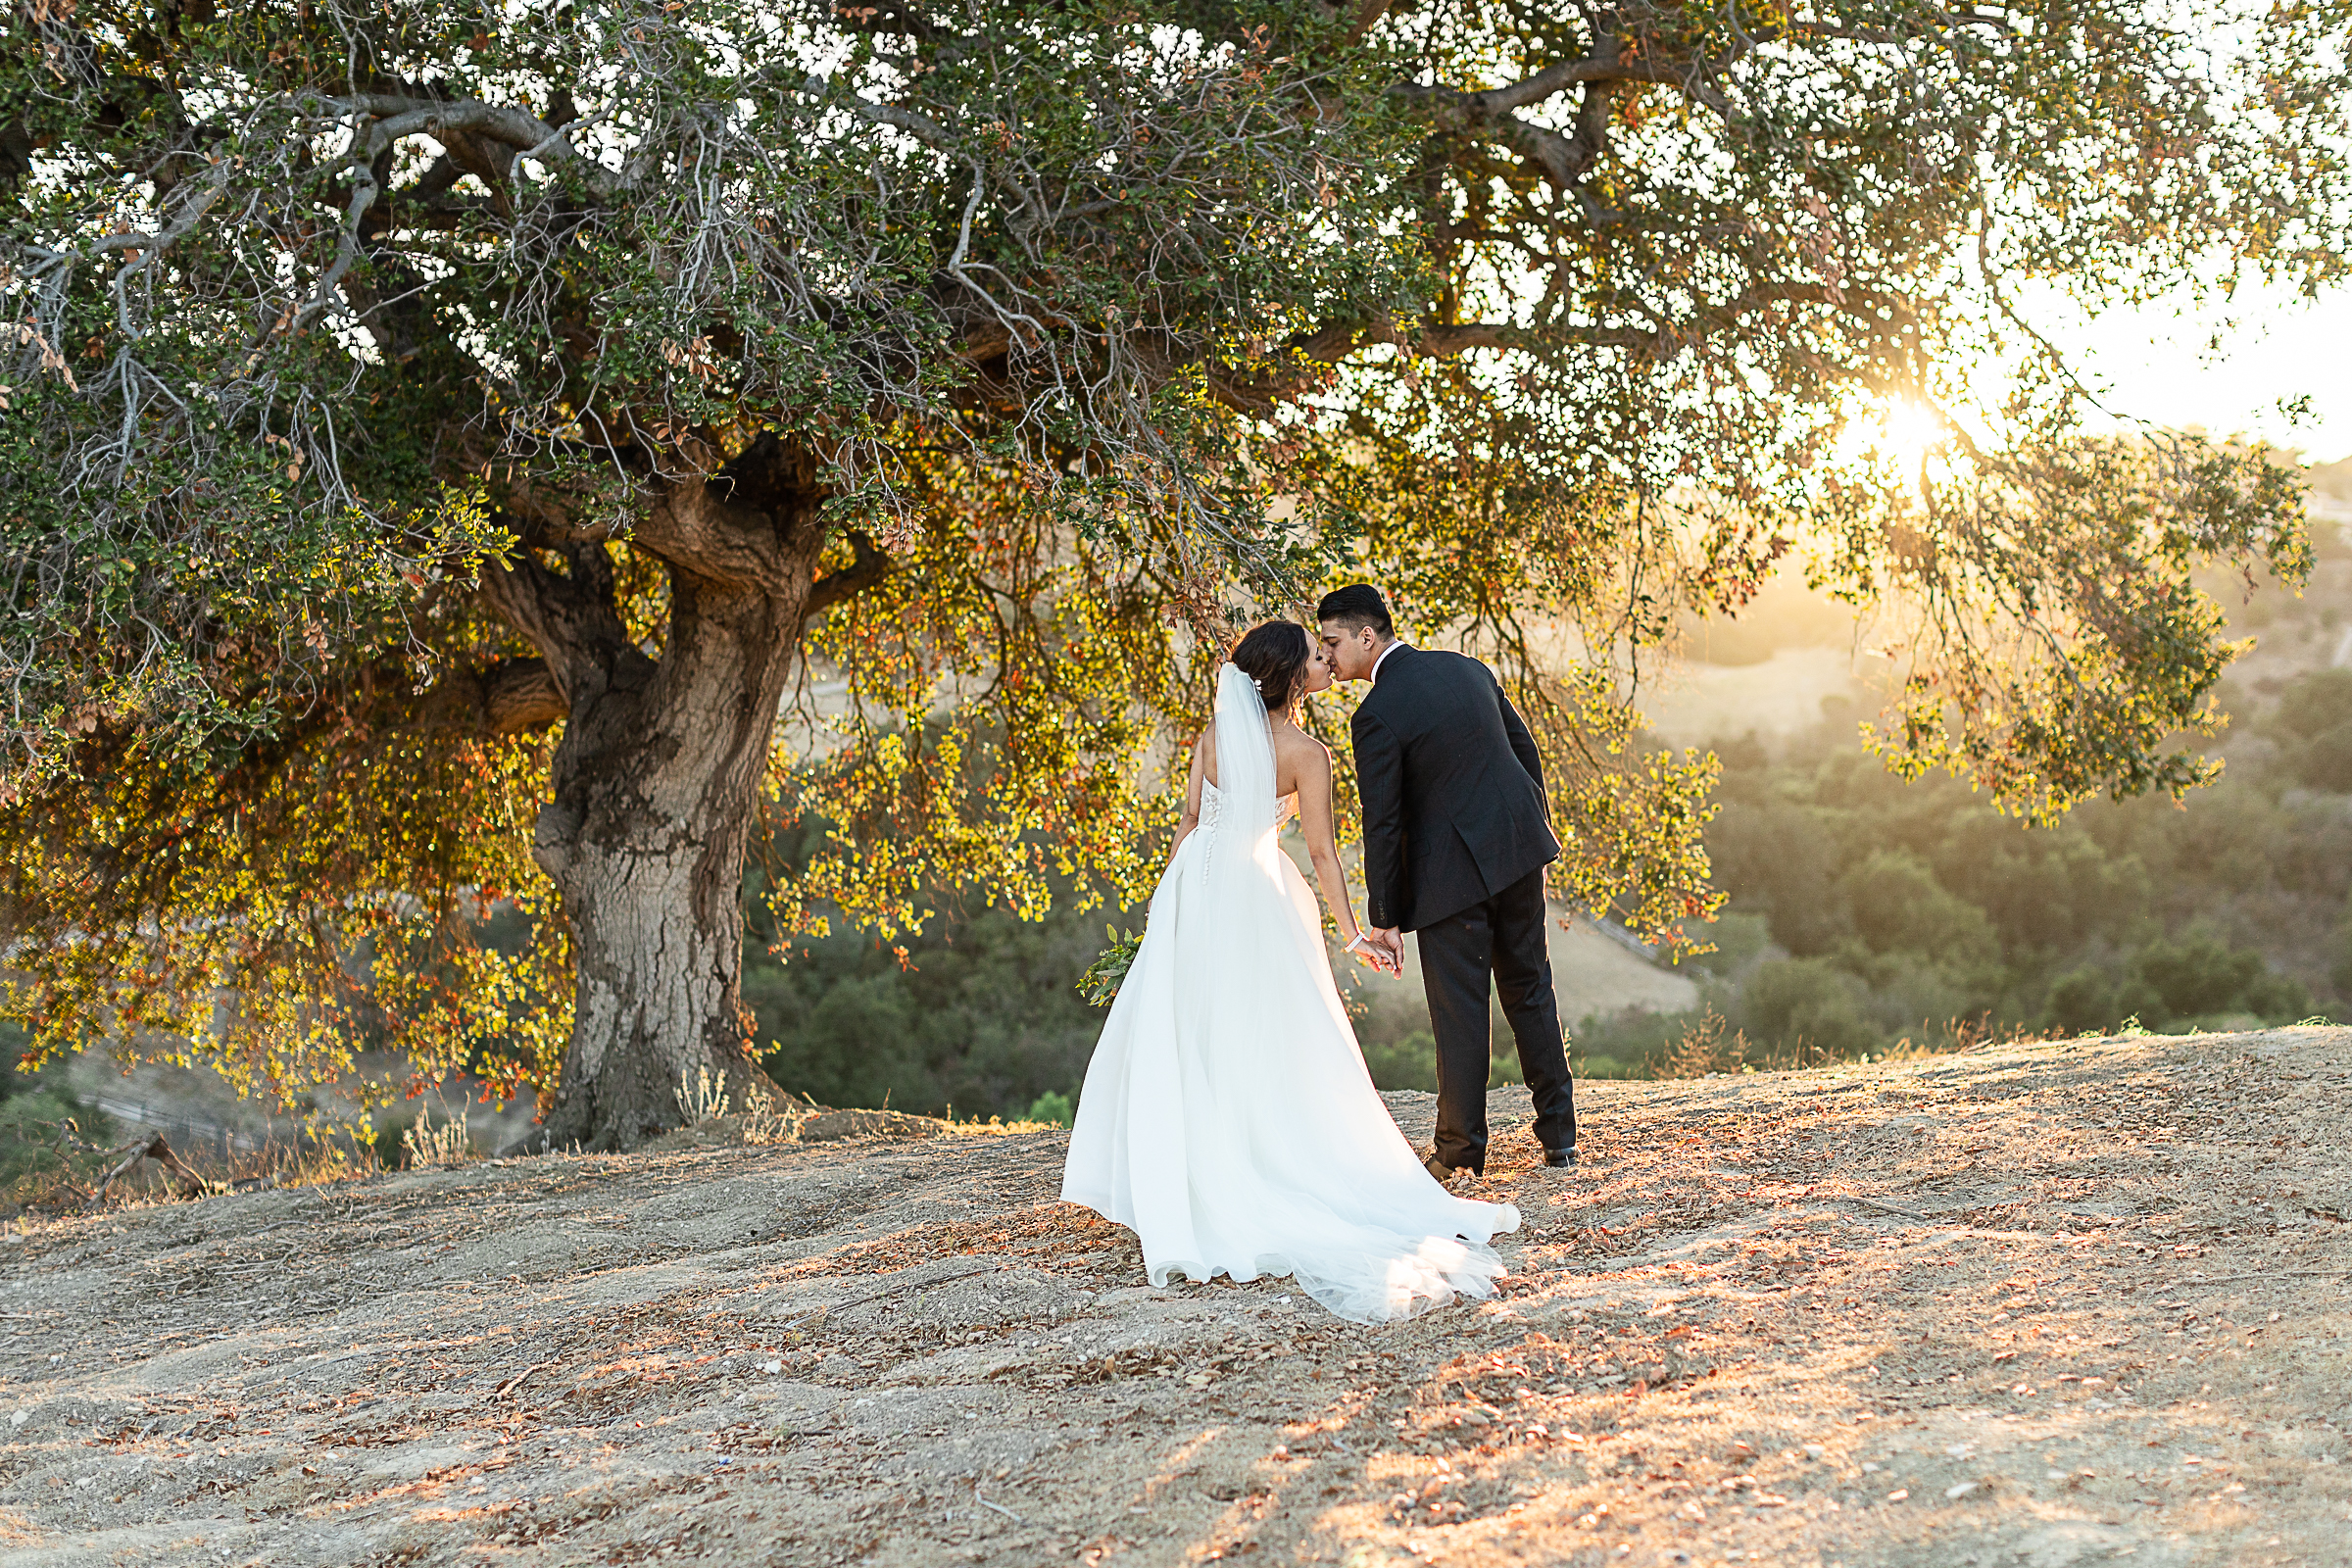 Medina and Arash's Vellano Country Club Wedding, Chino Hills-22.jpg